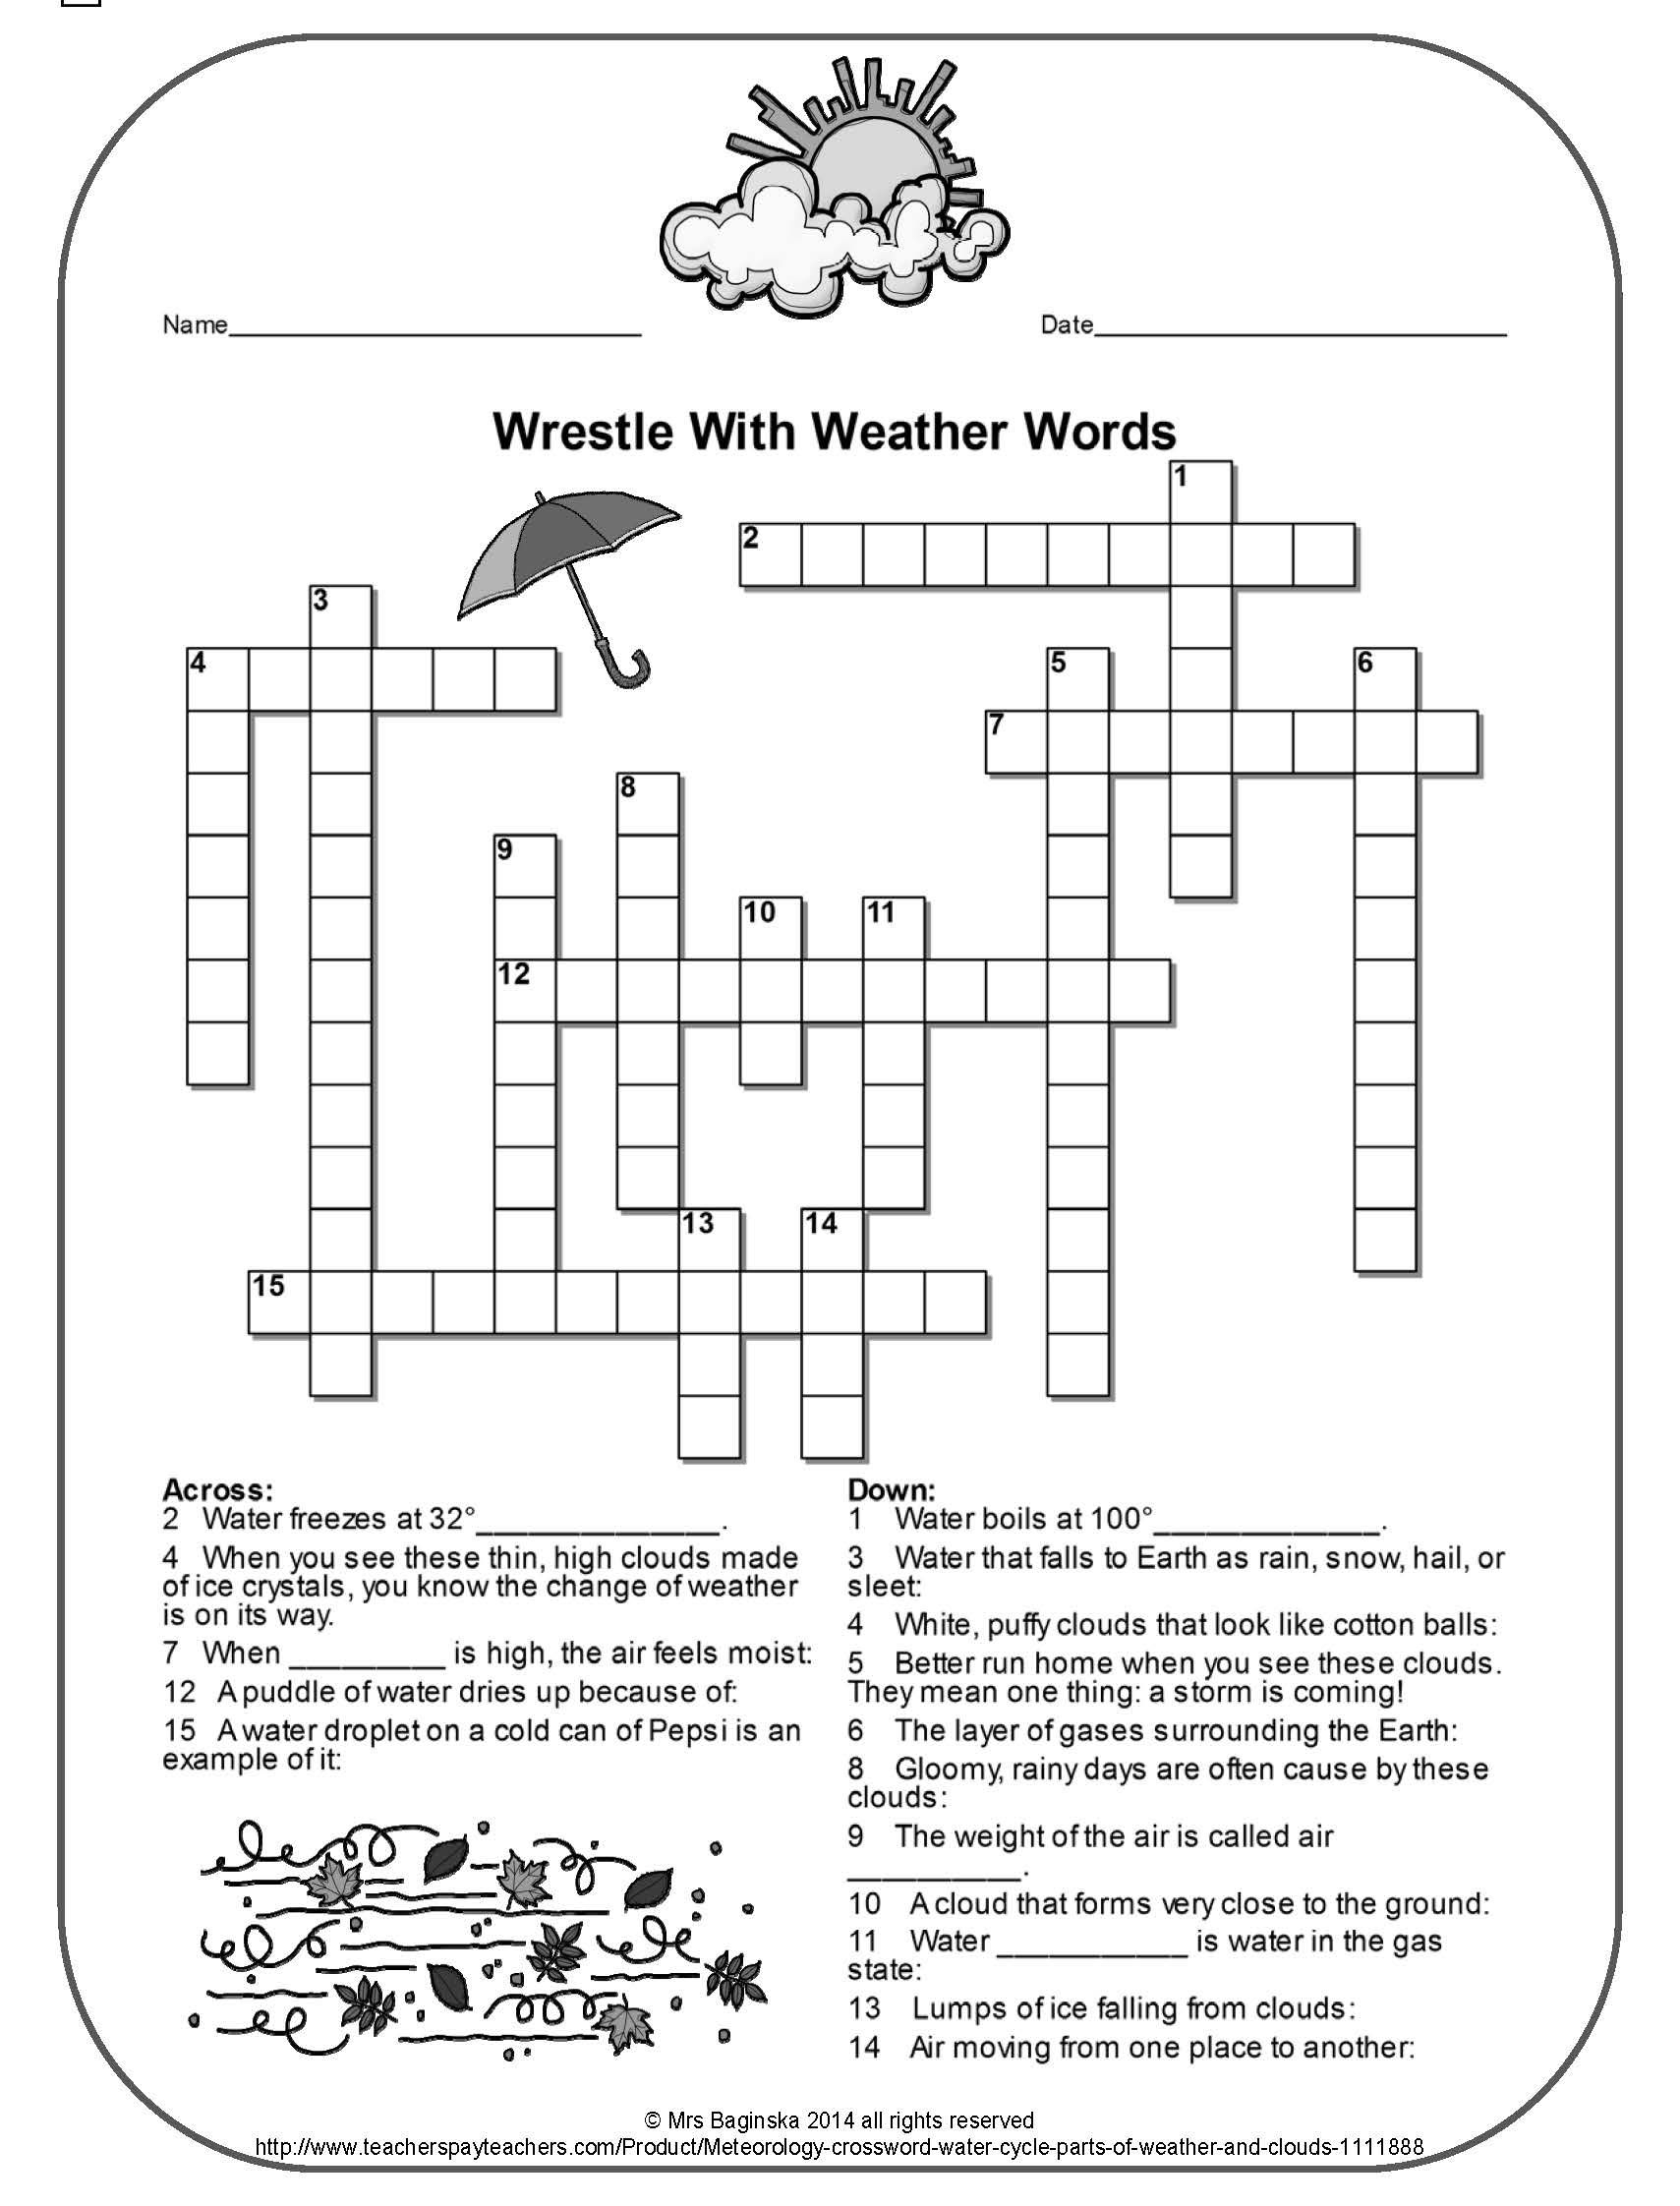 Printable Crossword Puzzles 4th Grade